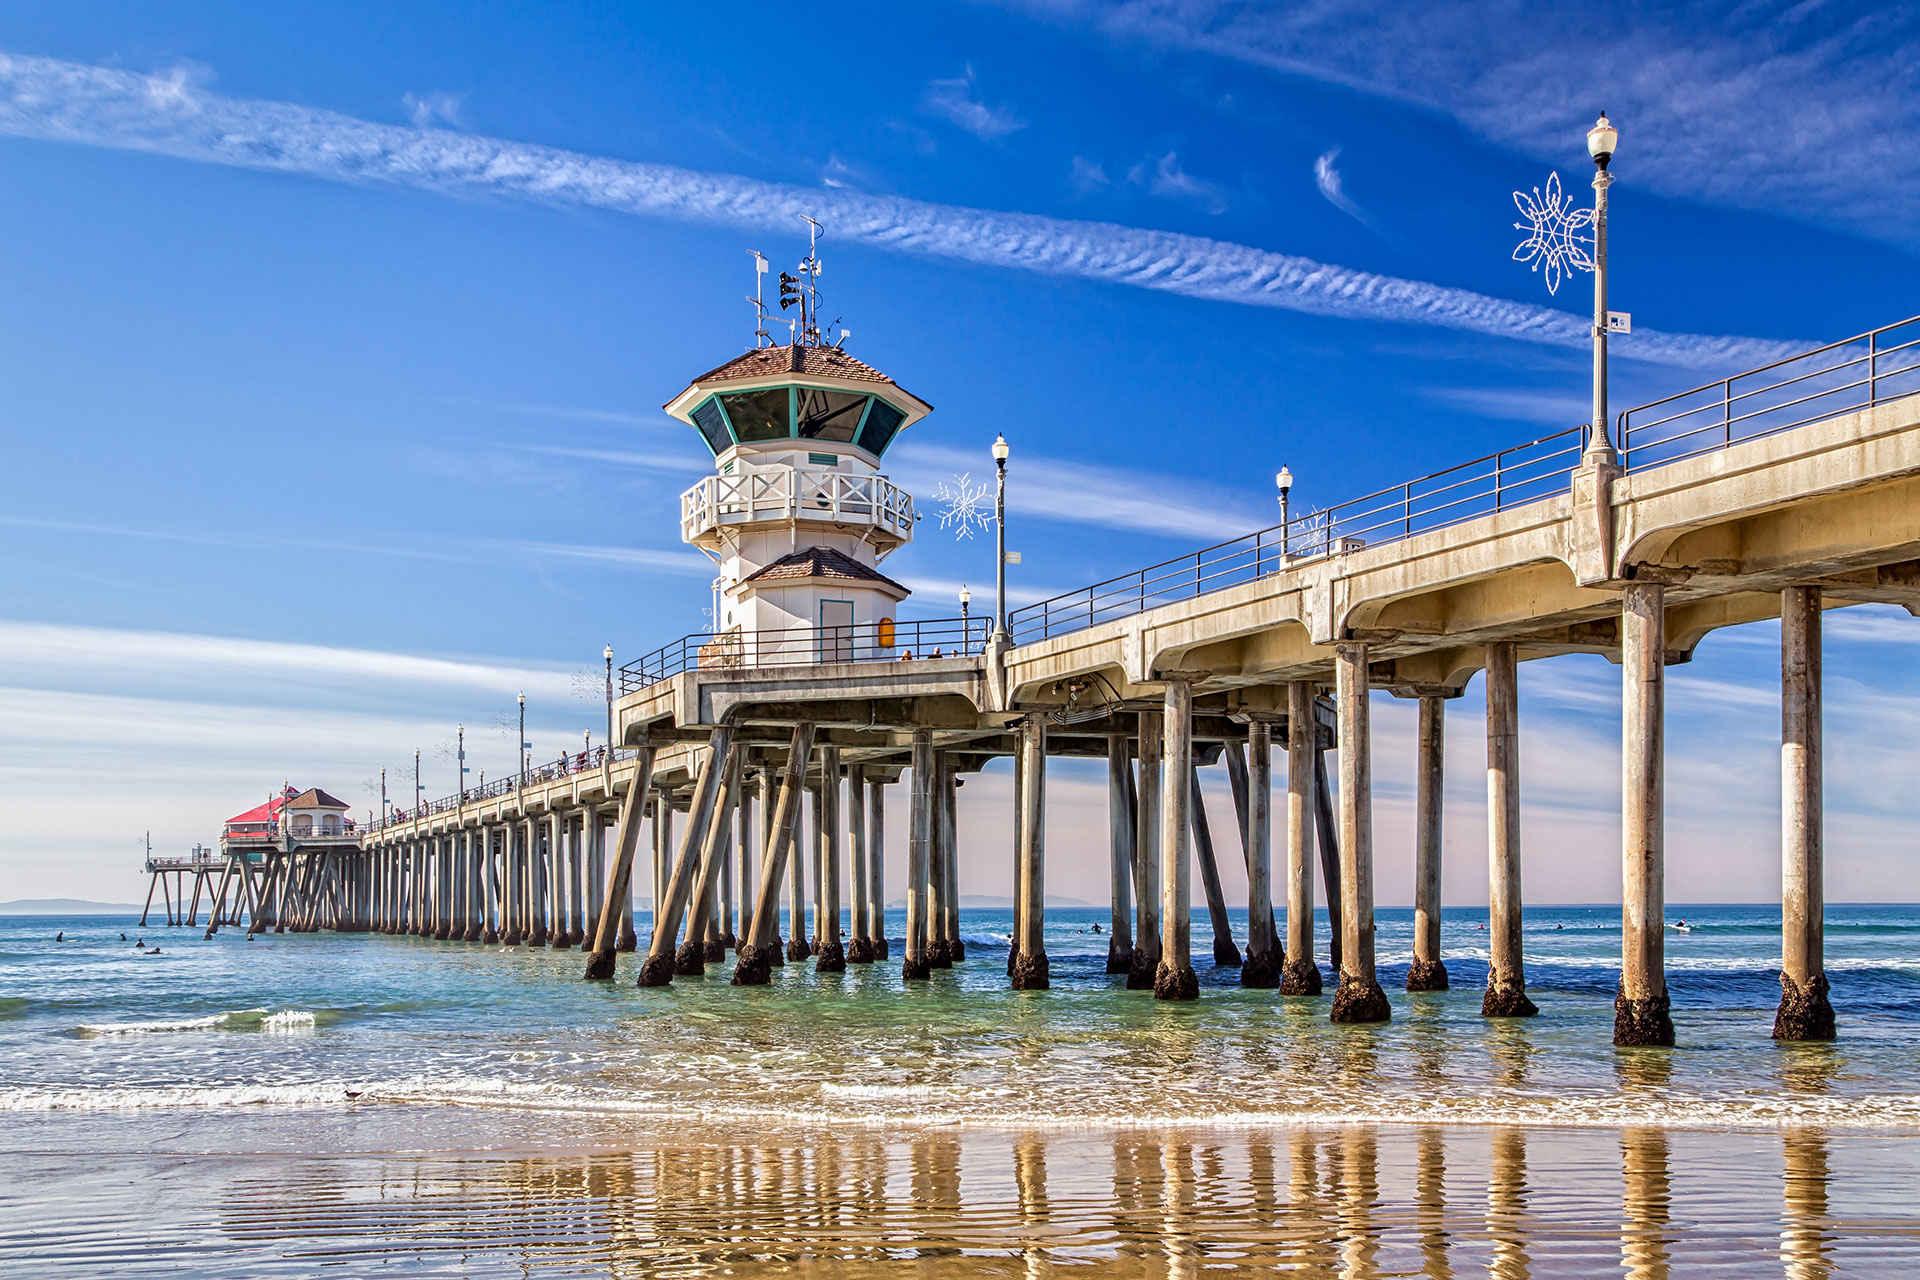 huntington state beach pier; Courtesy of Ken Wolter/Shutterstock